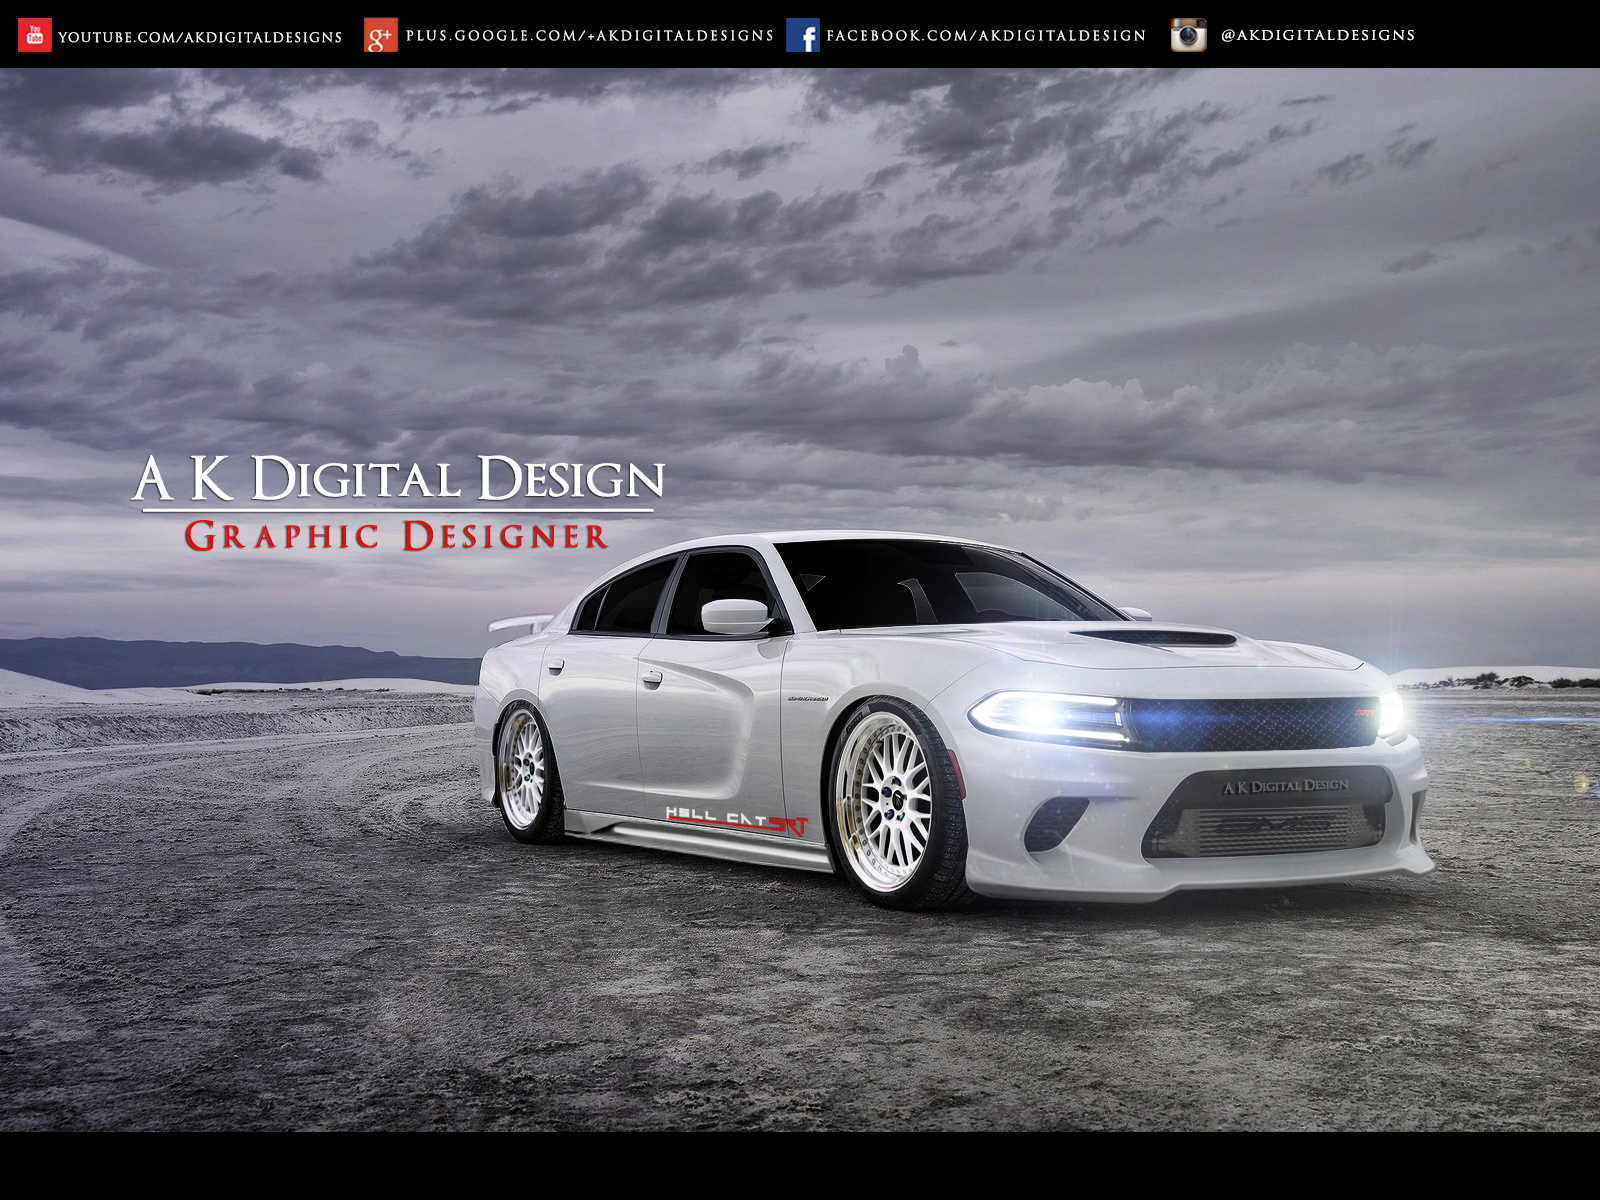 2015 Dodge Charger Srt Hellcat Modified By Akdigitaldesigns On